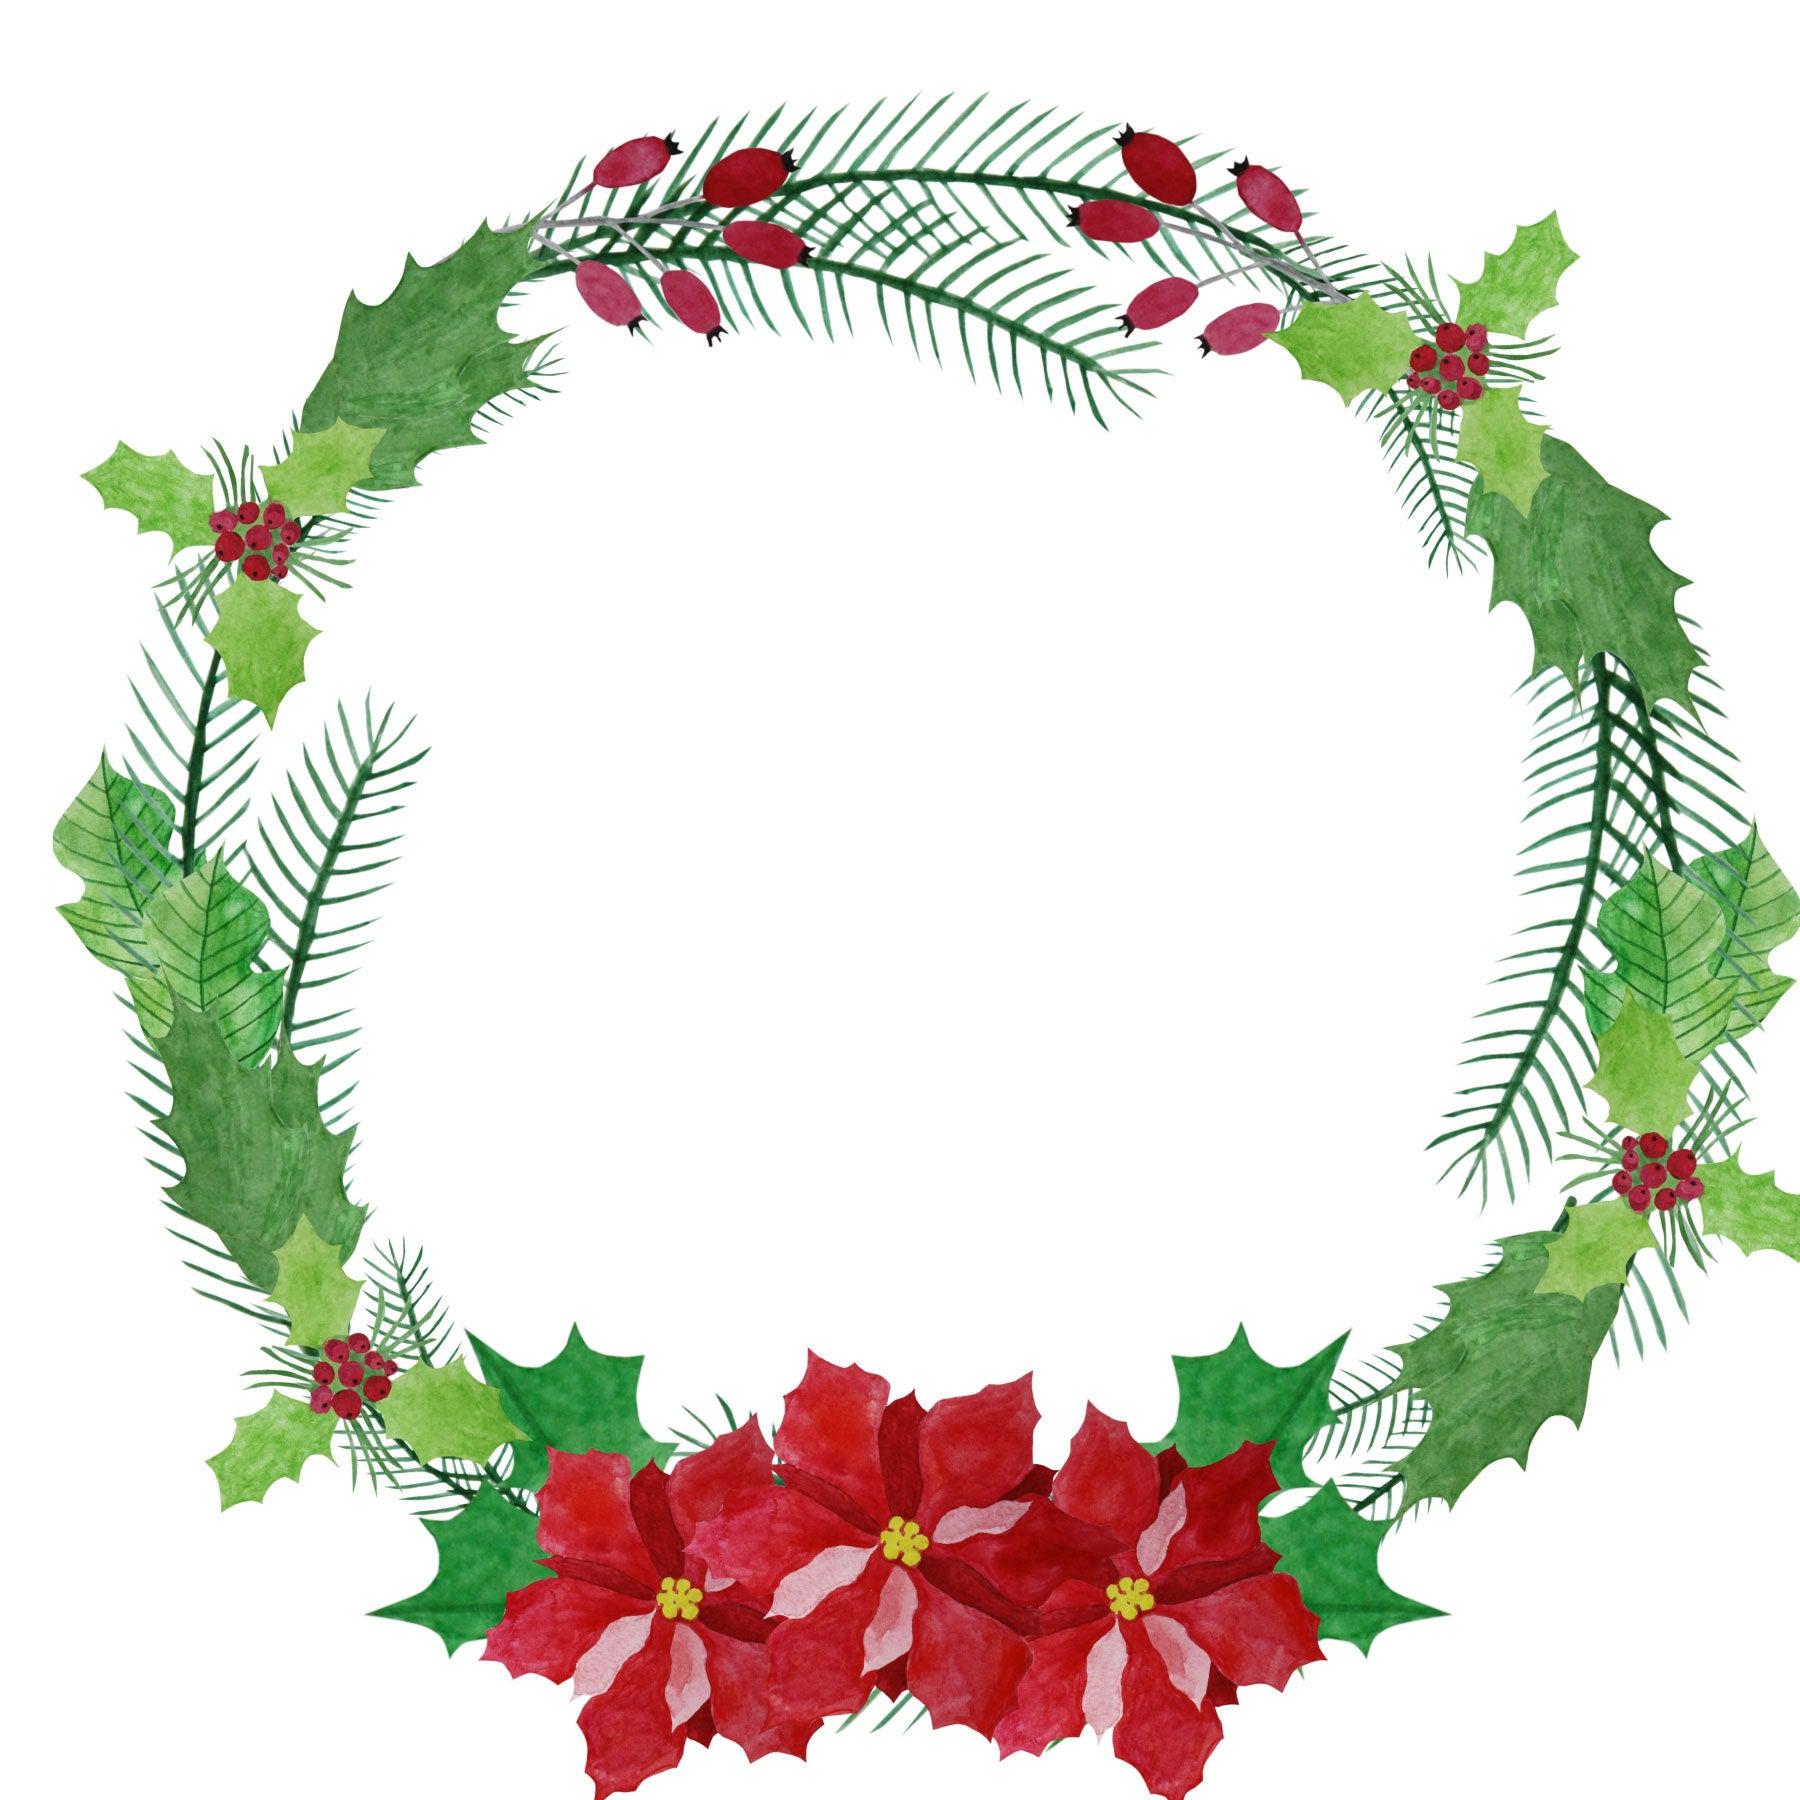 watercolor wreath clipart poinsettia wreath christmas wreath rh etsystudio com wreath clip art invisible inside wreath clipart free